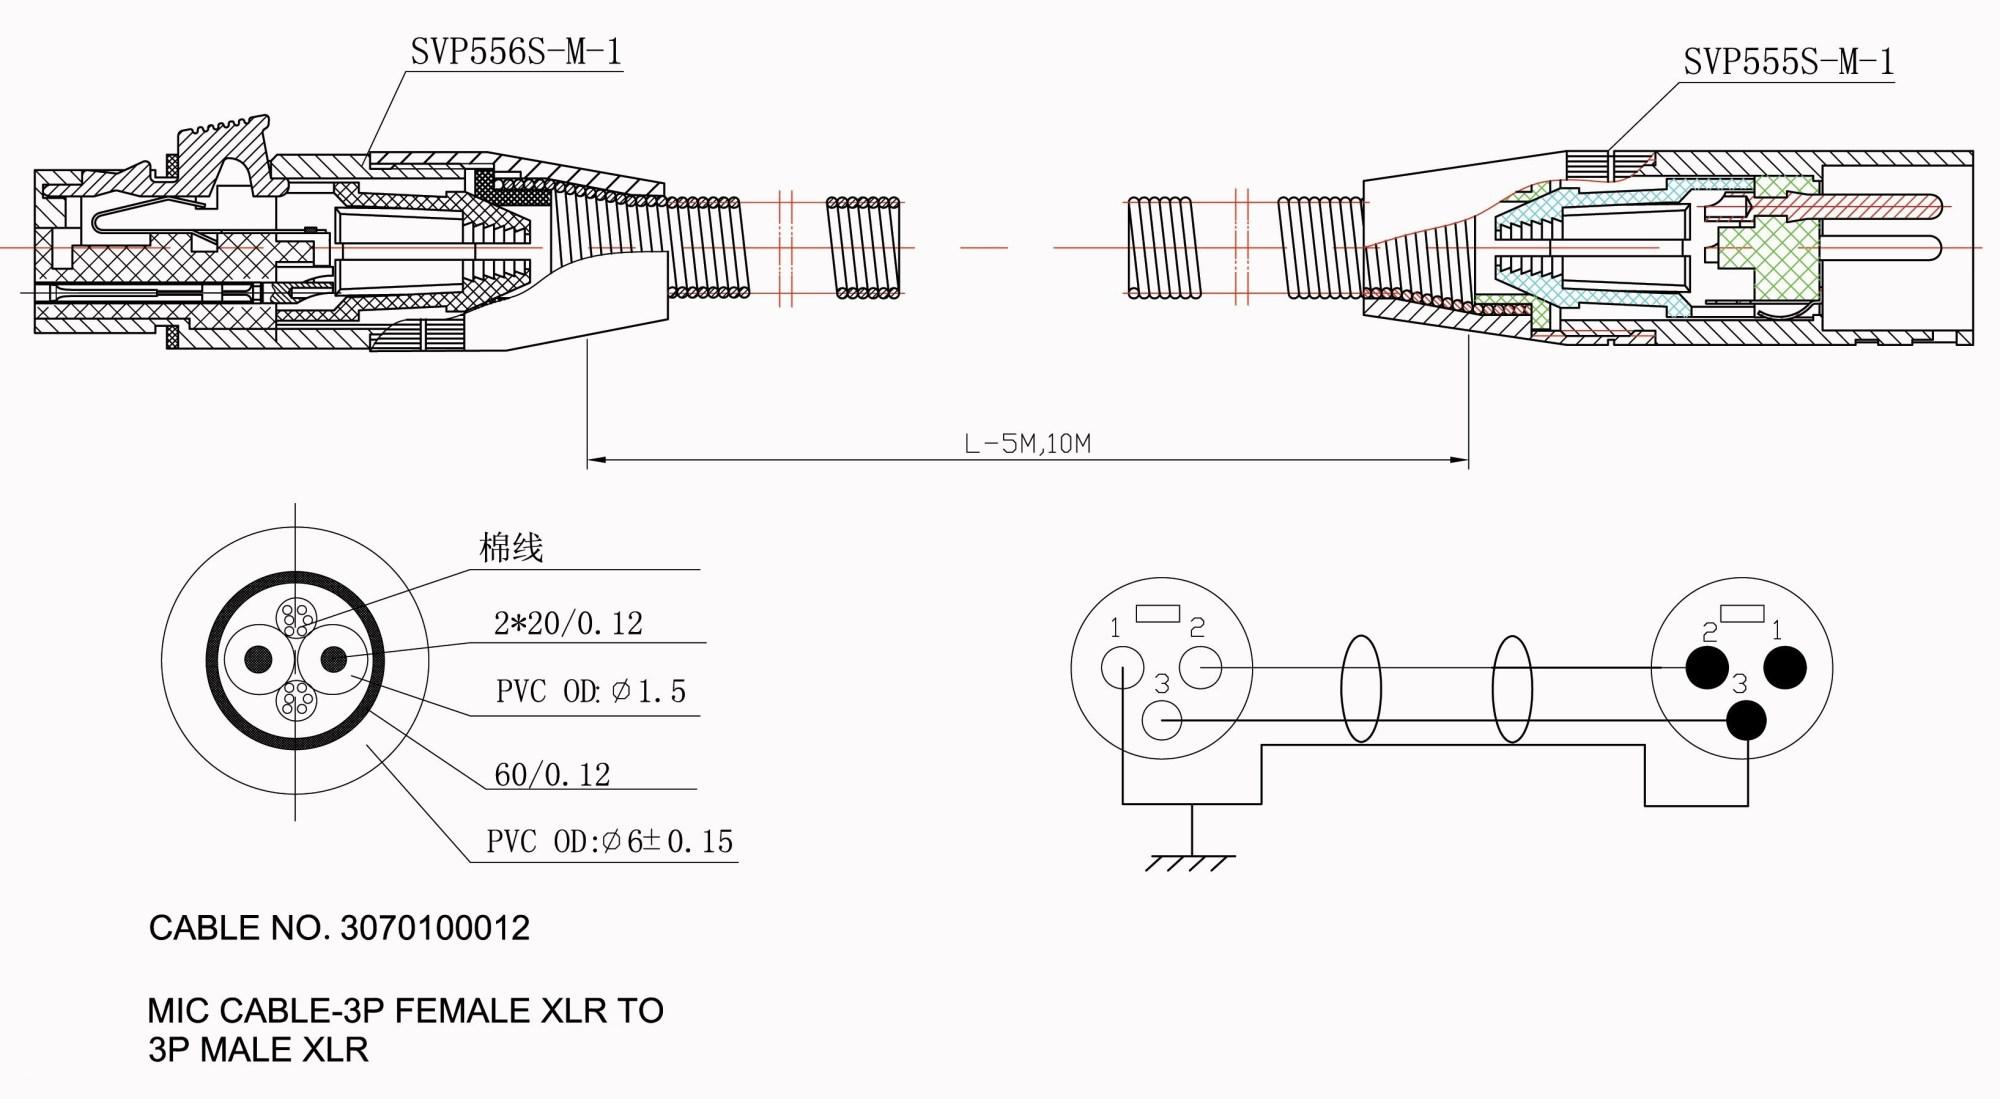 hight resolution of 2001 ford 7 3 liter diesel engine diagram 7 3 powerstroke glow plug relay wiring diagram fresh wiring diagram